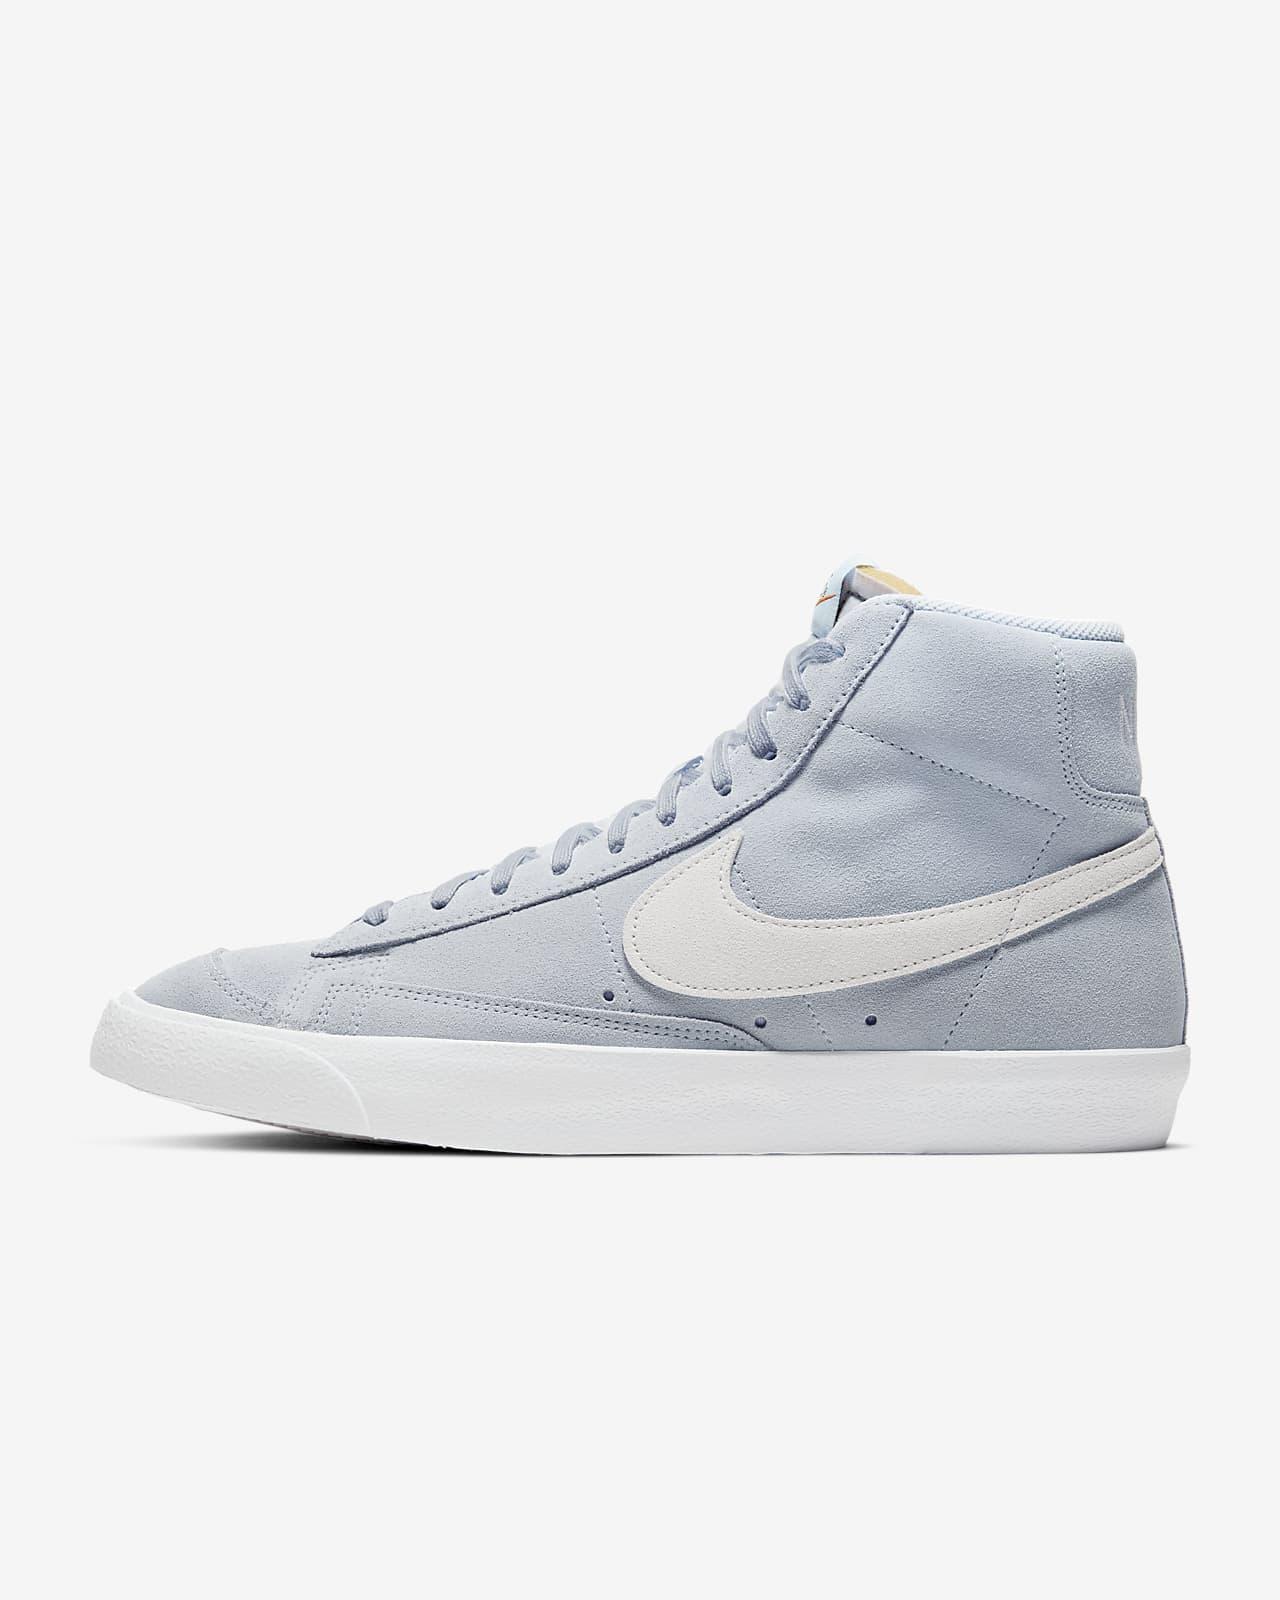 Nike Blazer Mid '77 Suede Shoe. Nike LU